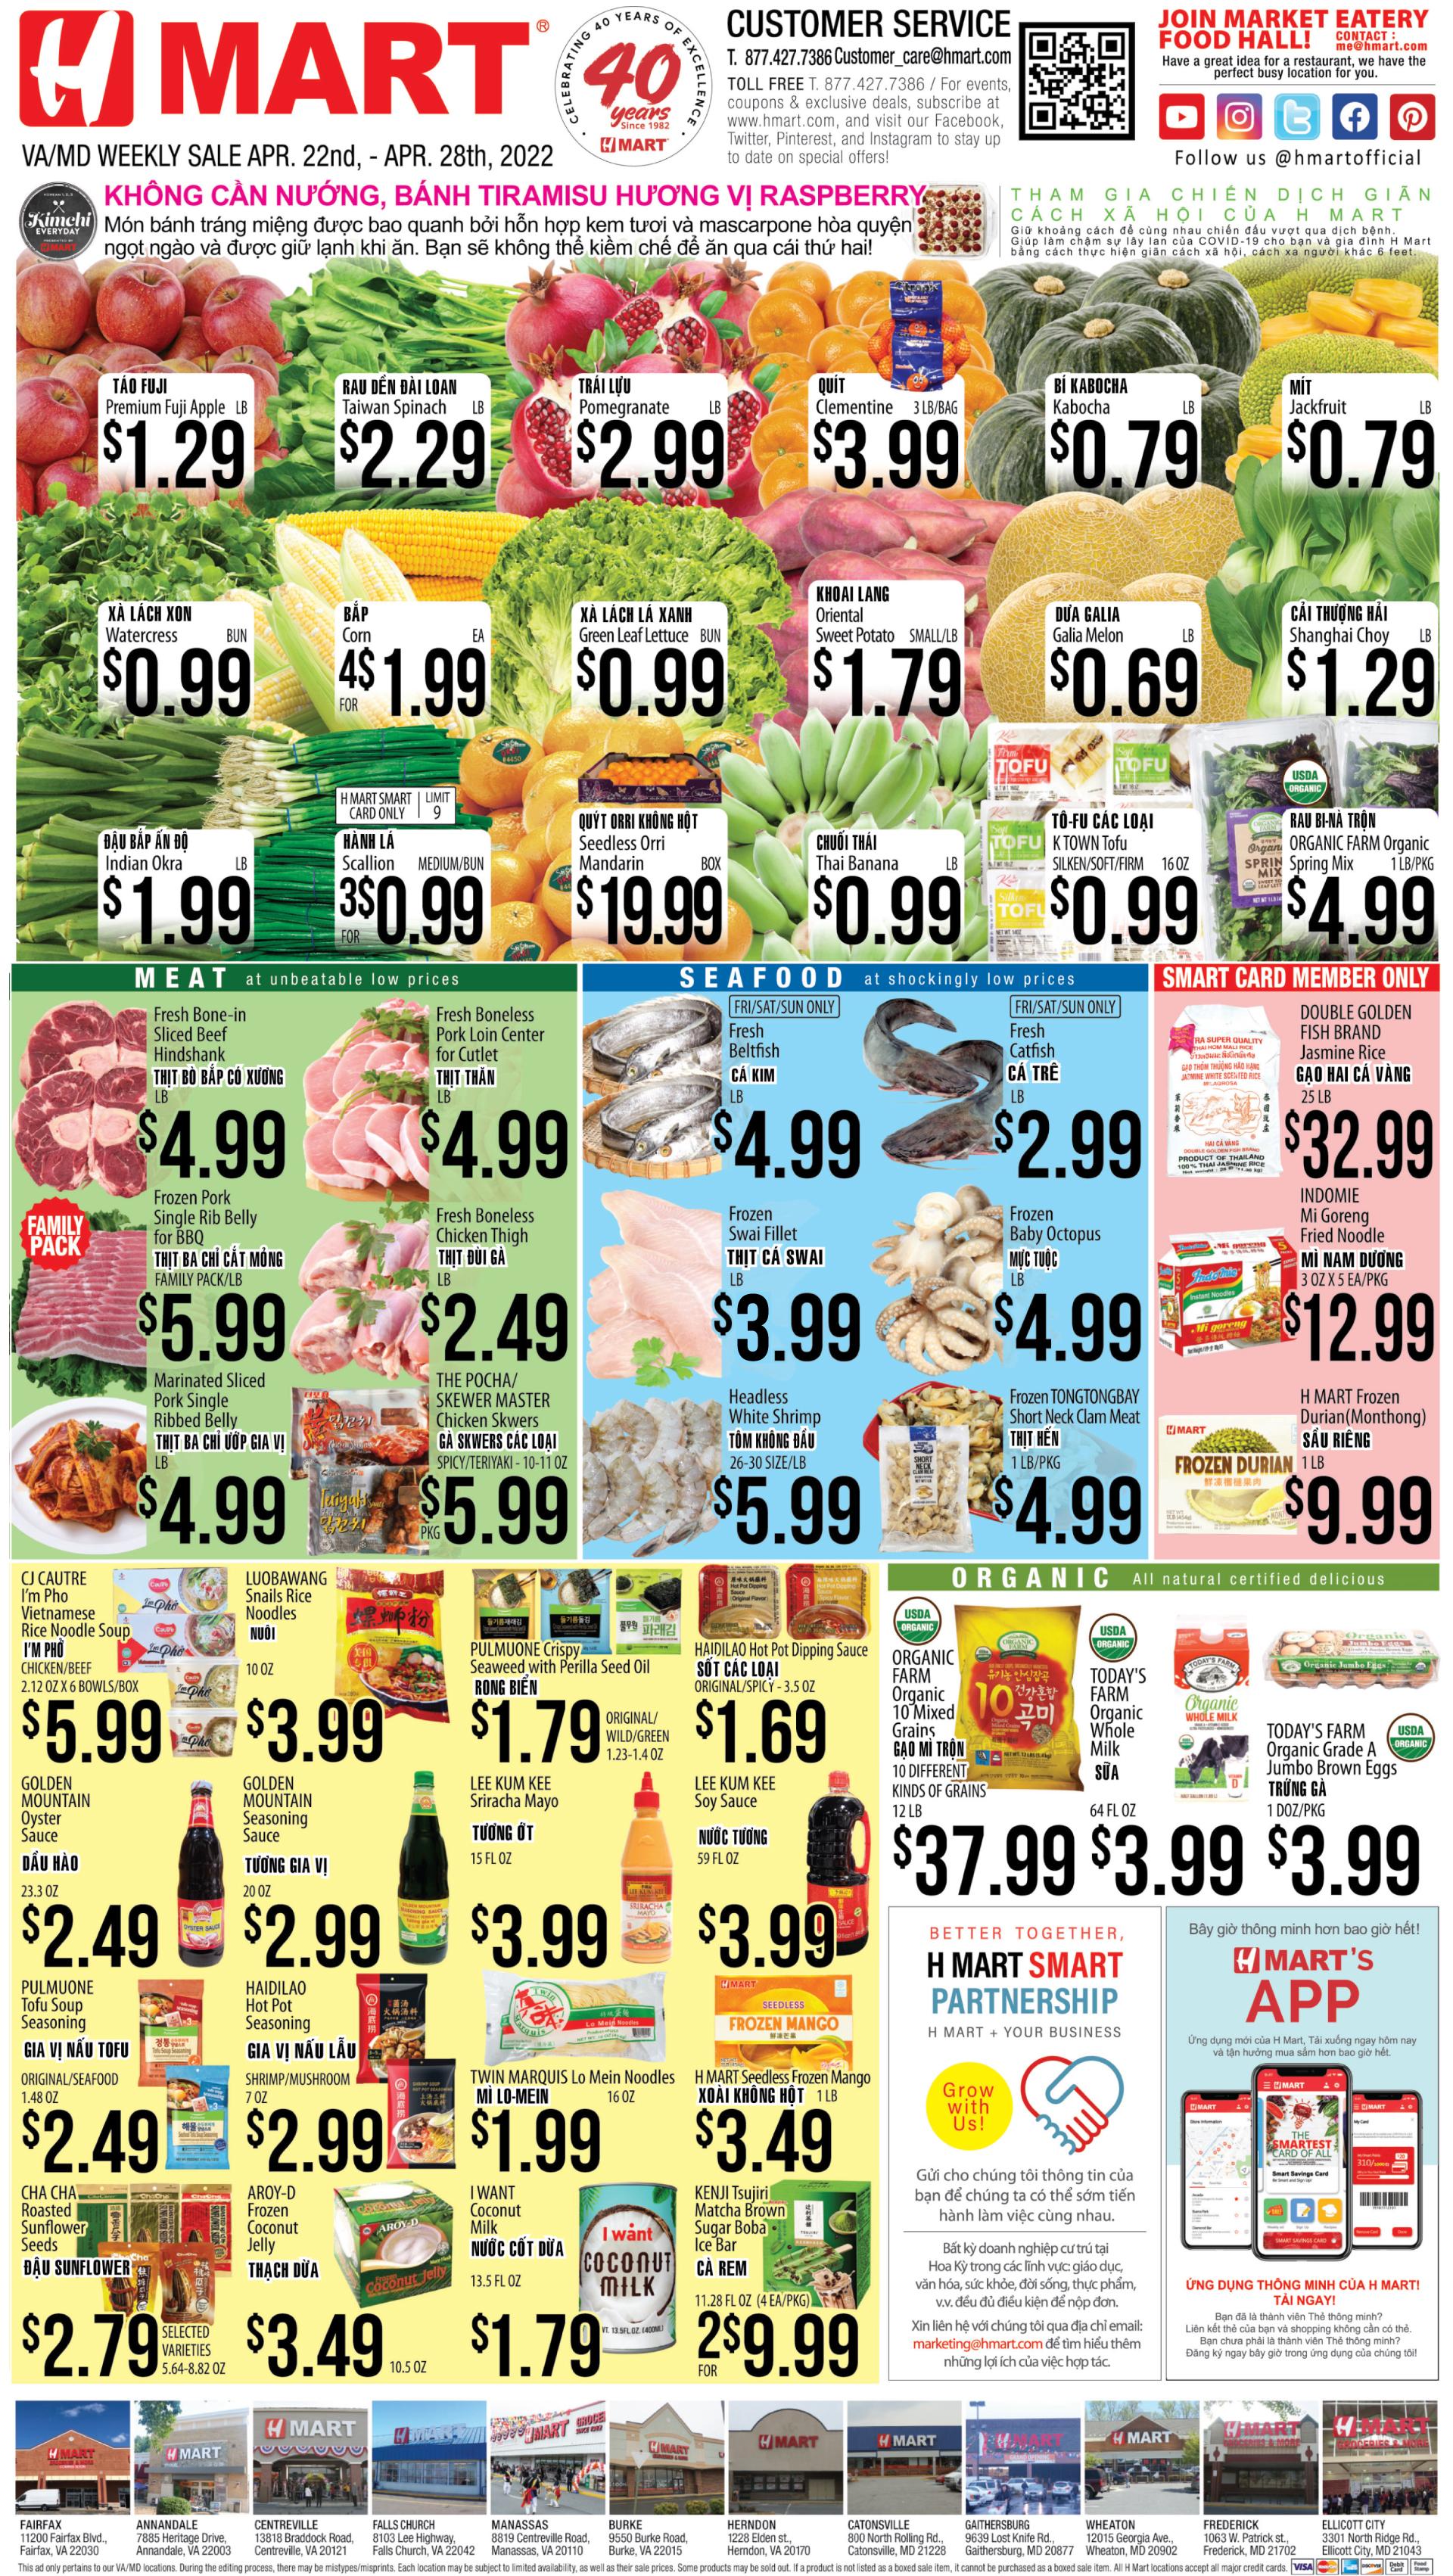 Weekly sales on Maryland & Virginia